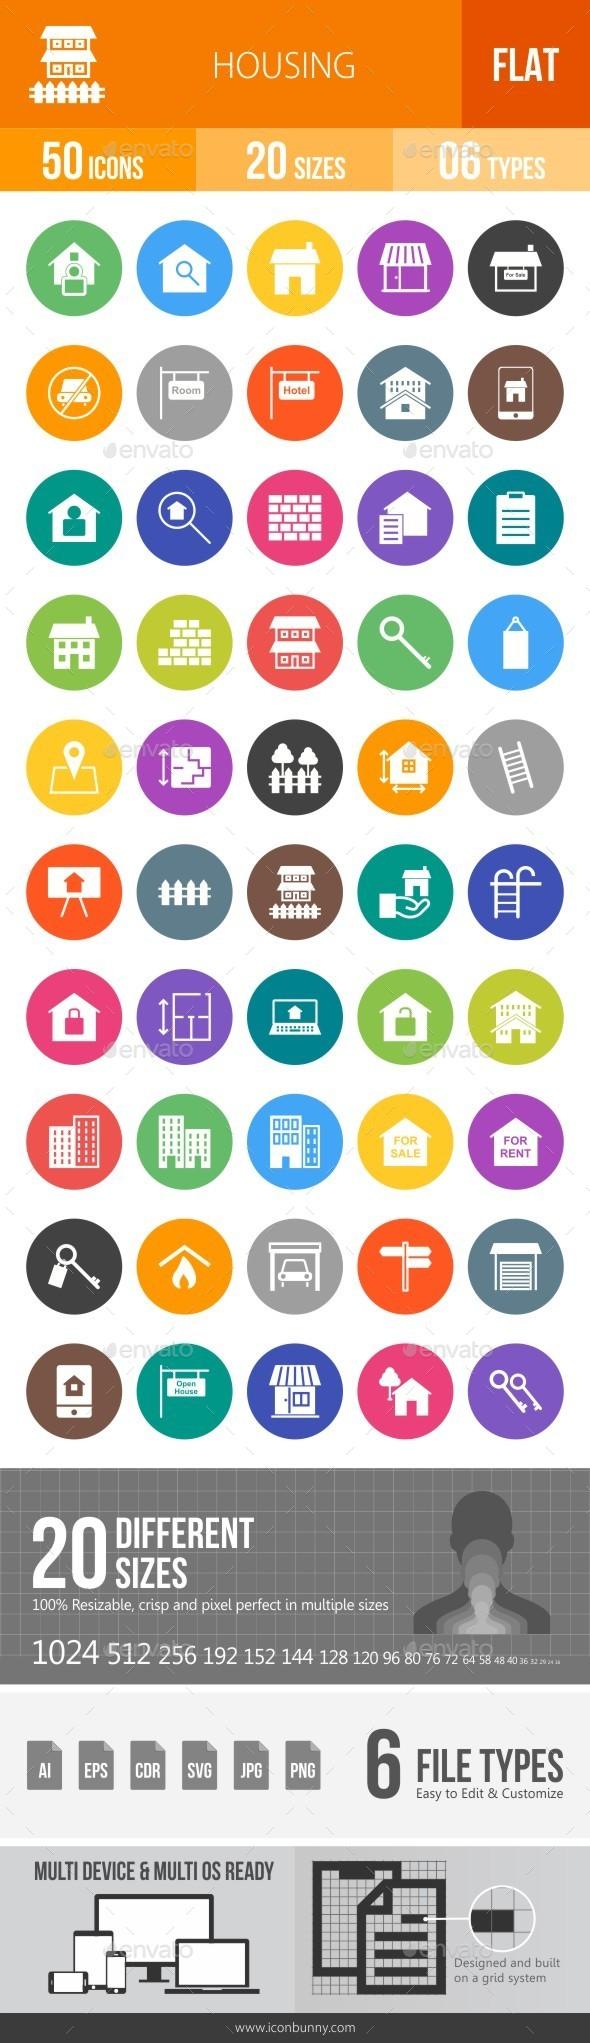 Housing Flat Round Icons - Icons